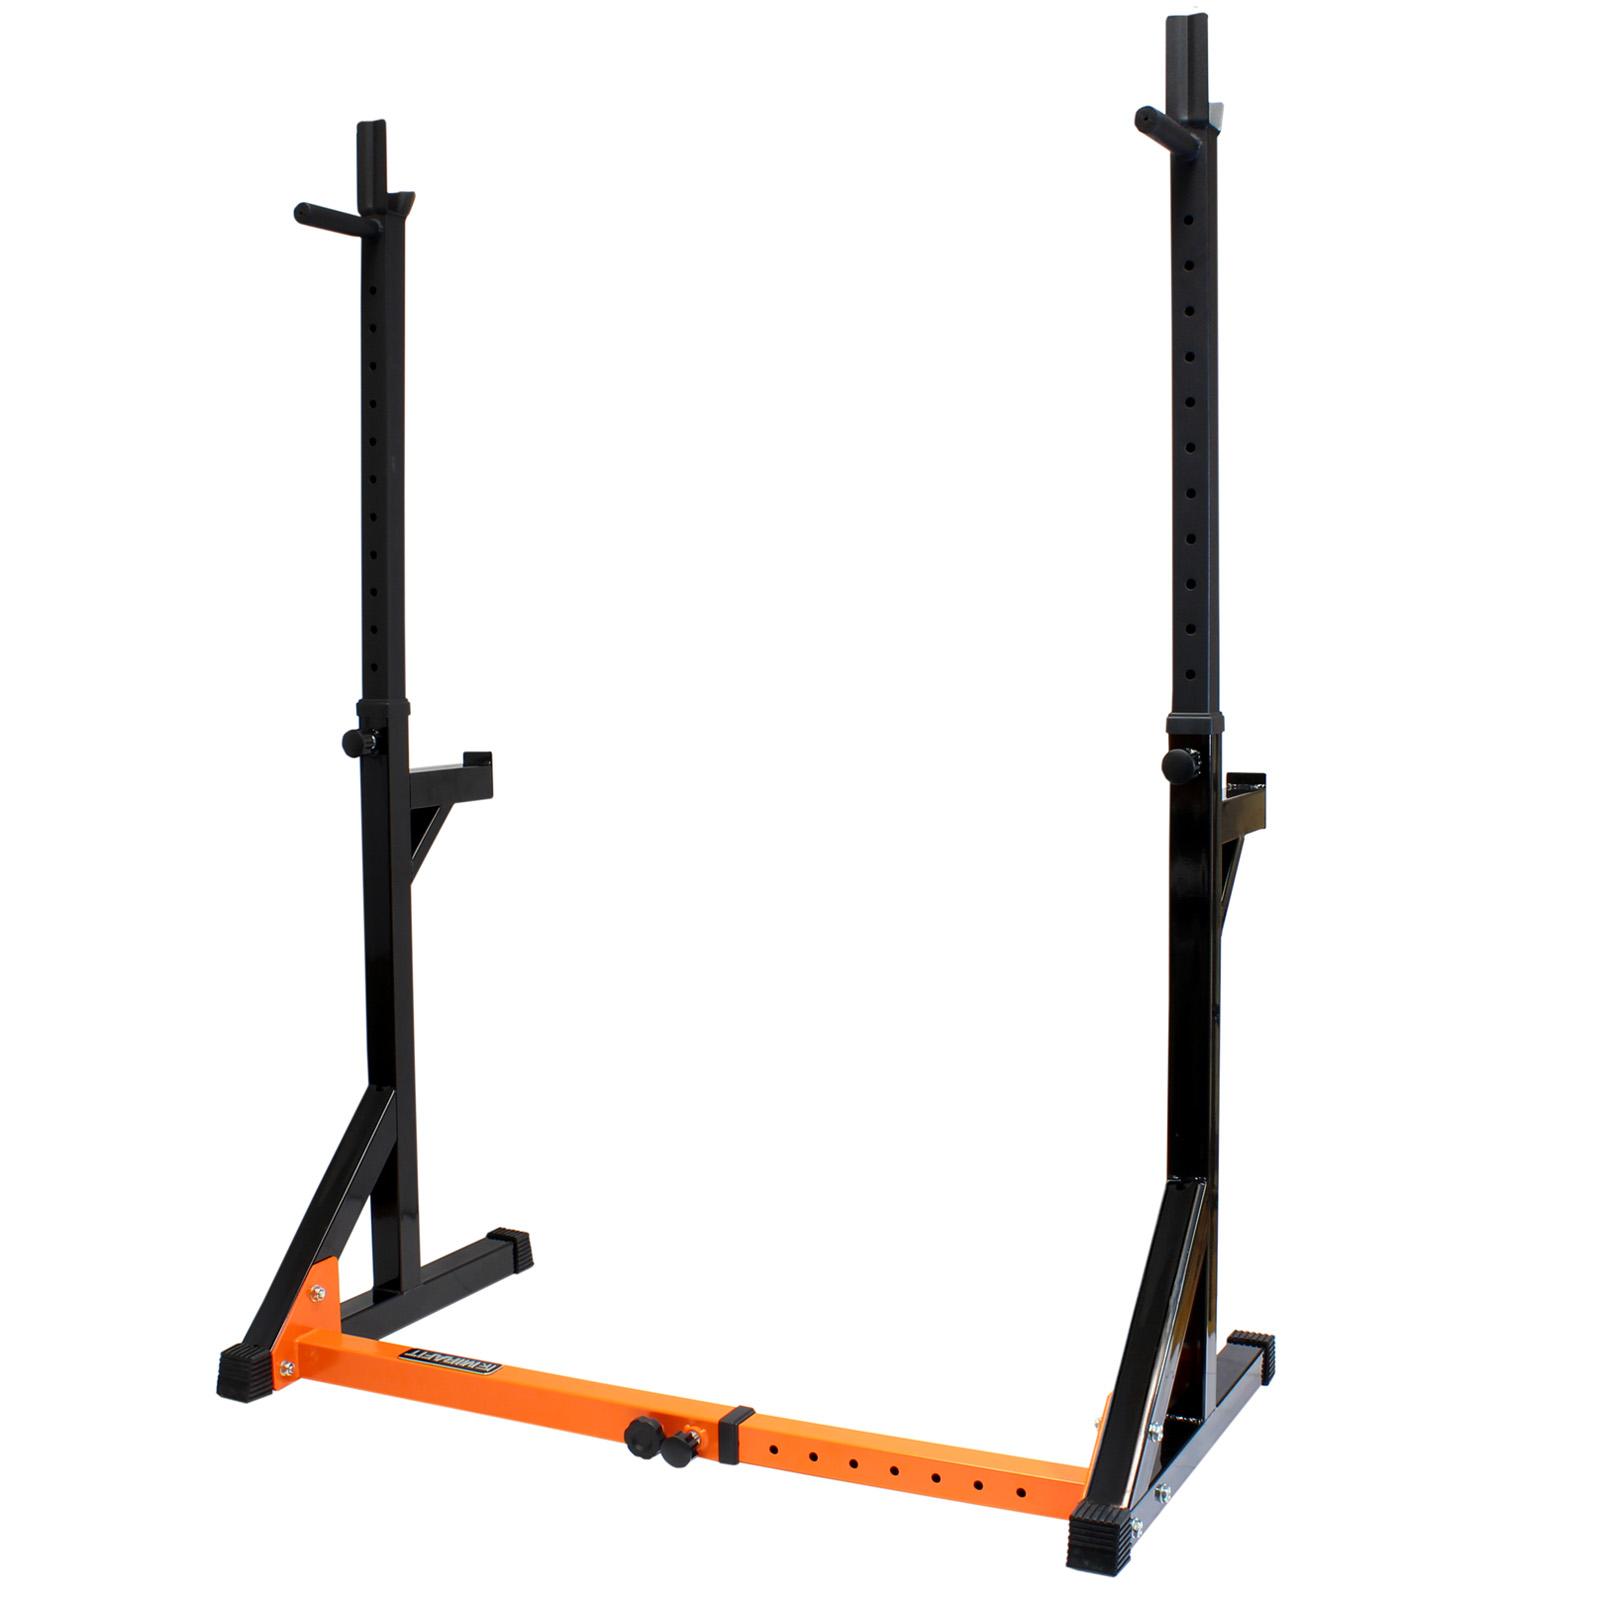 Mirafit Fully Adjustable Squat Amp Dip Rack Gym Weight